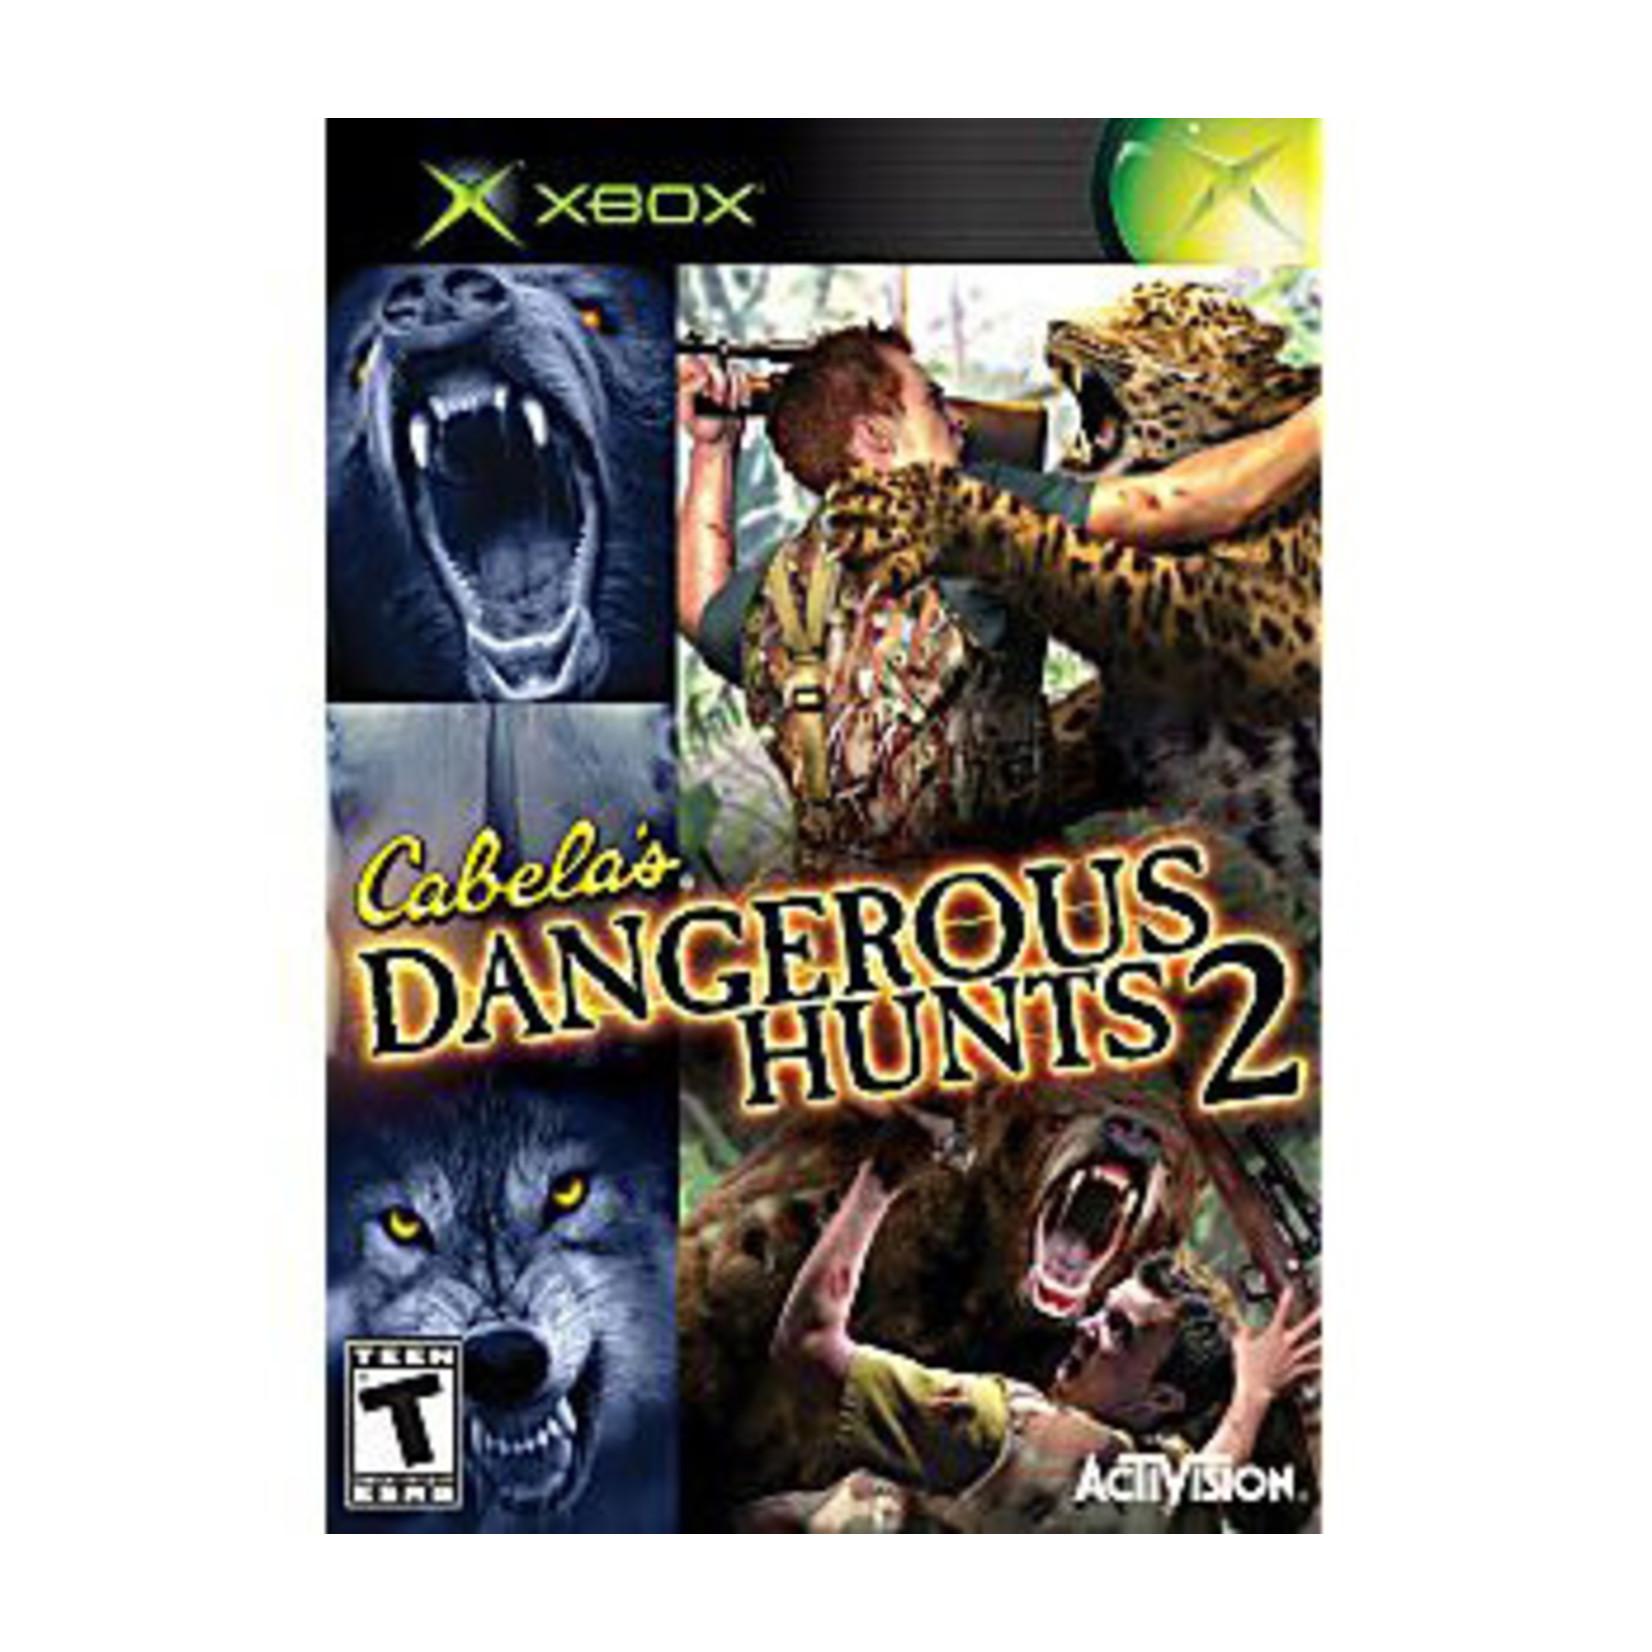 XBU-CABELAS DANGEROUS HUNTS 2